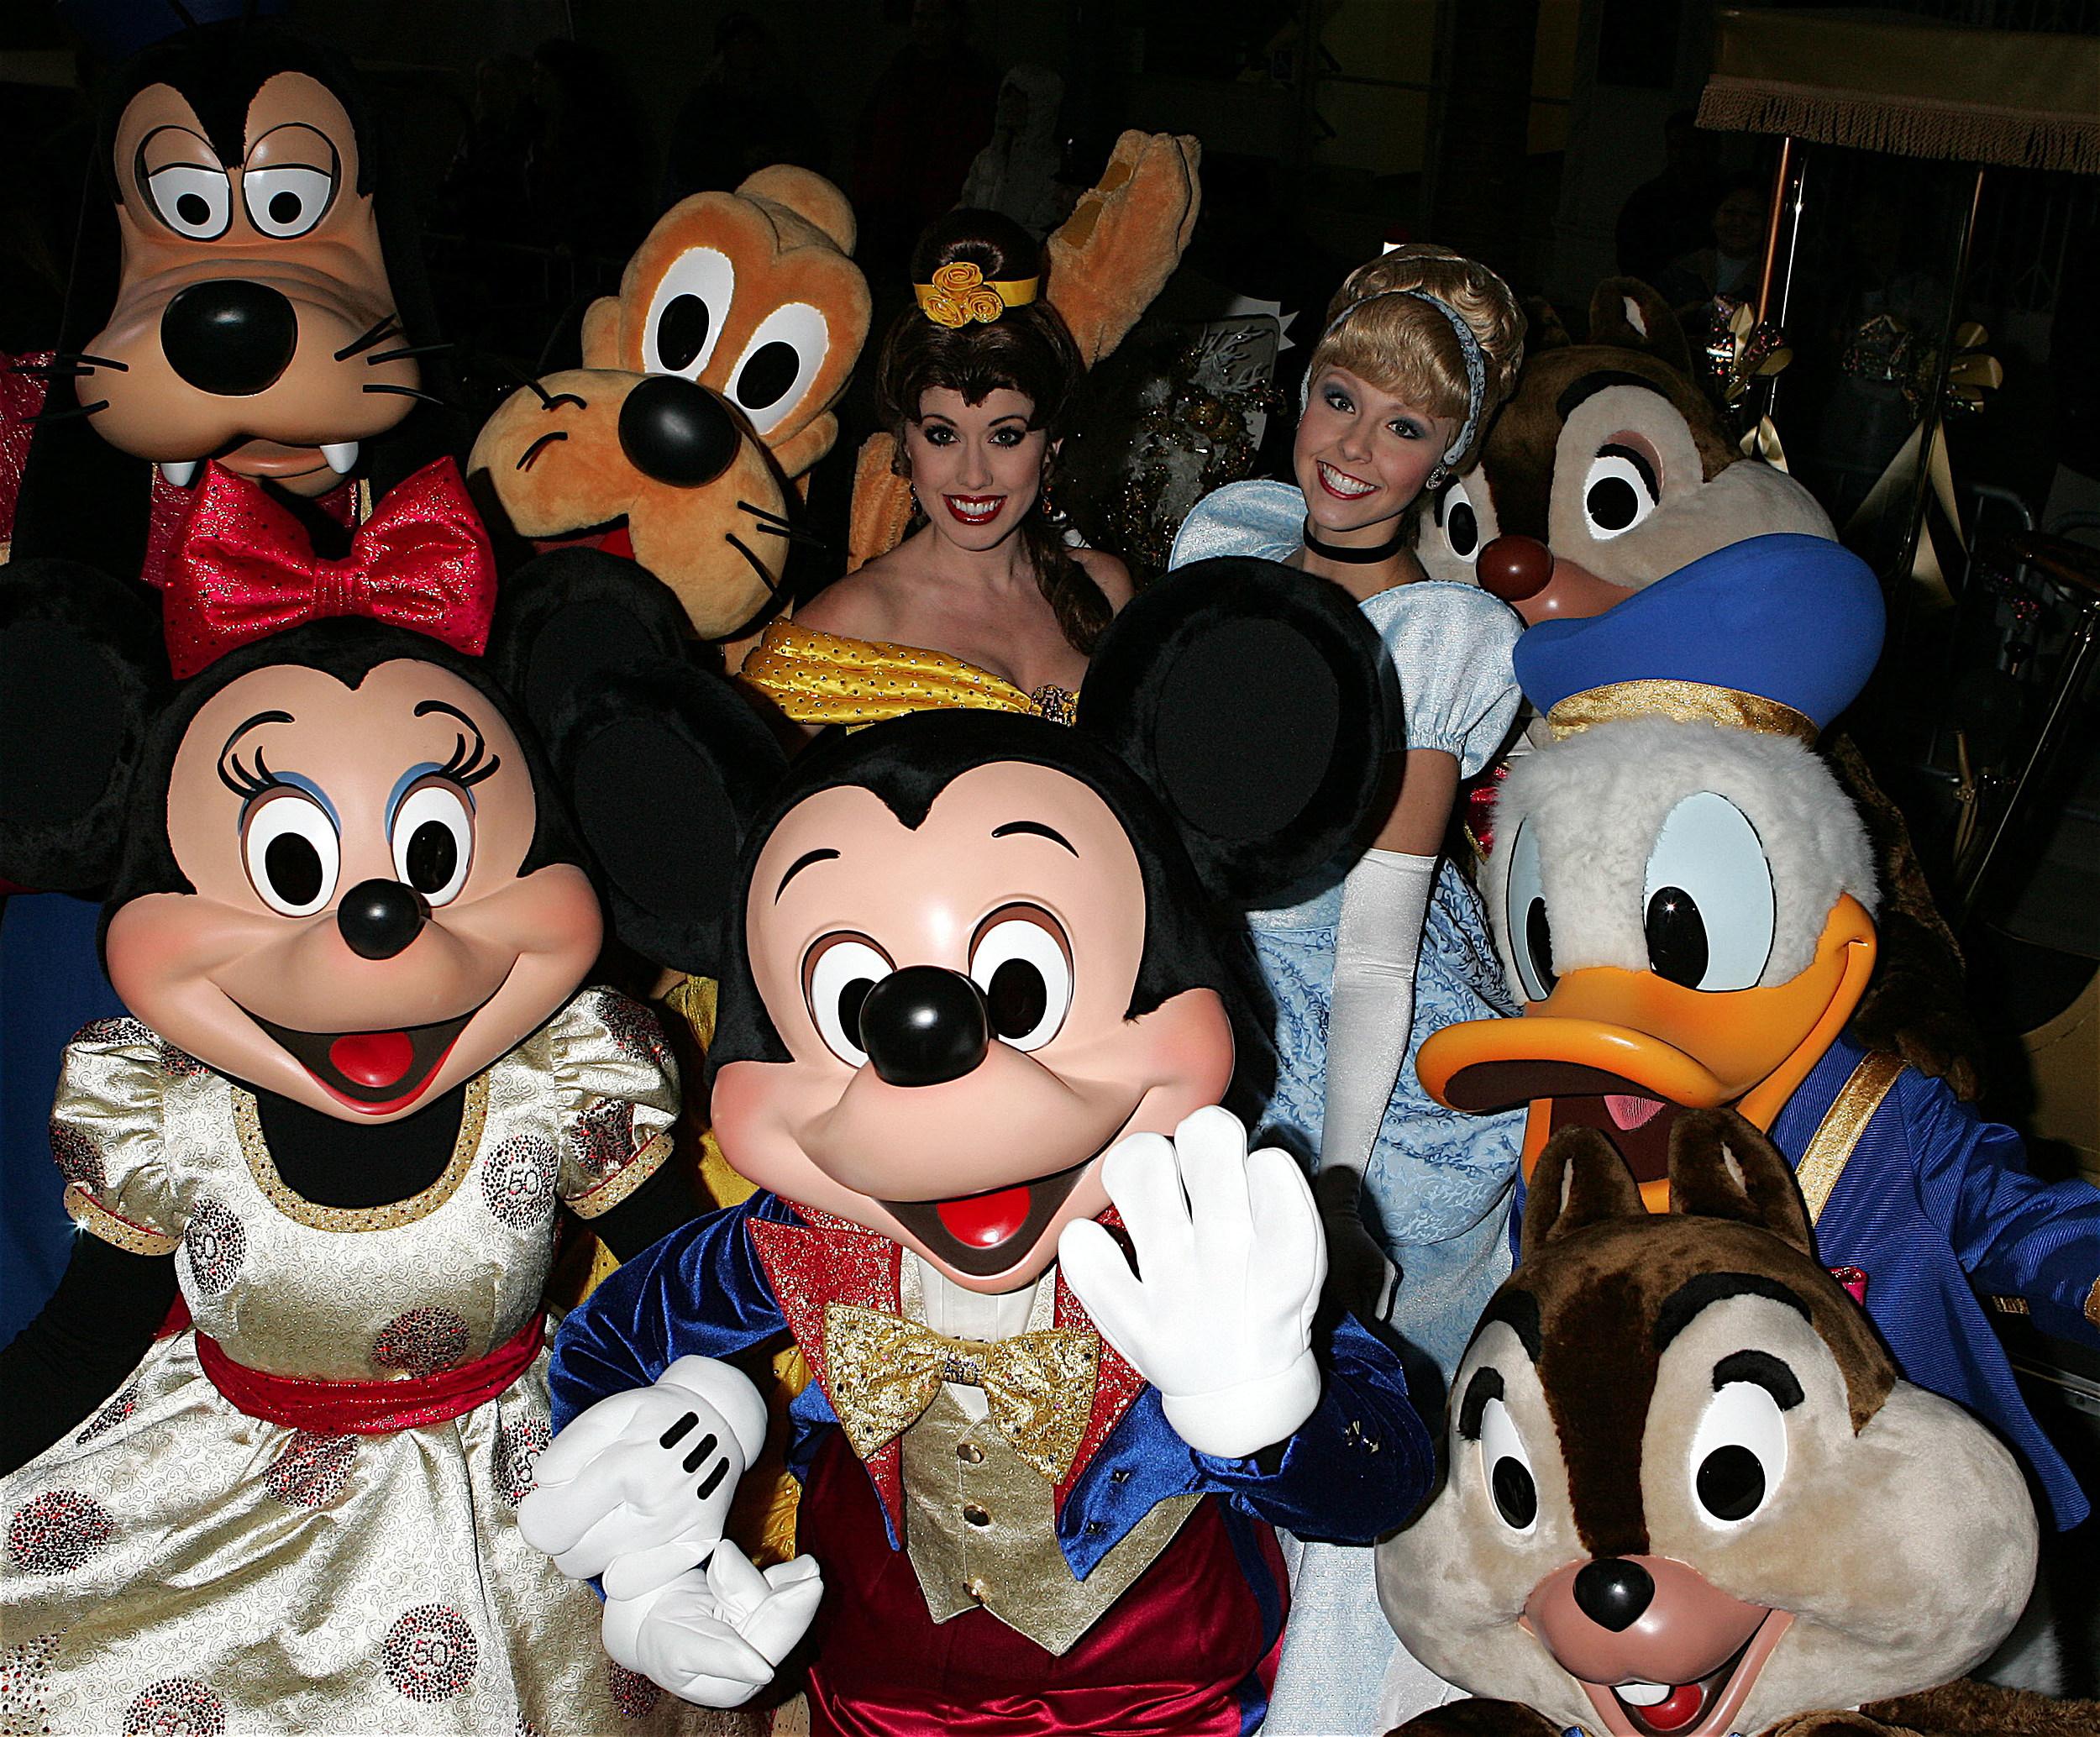 Disney 12 Days Of Christmas.The Disney 12 Days Of Christmas Watch